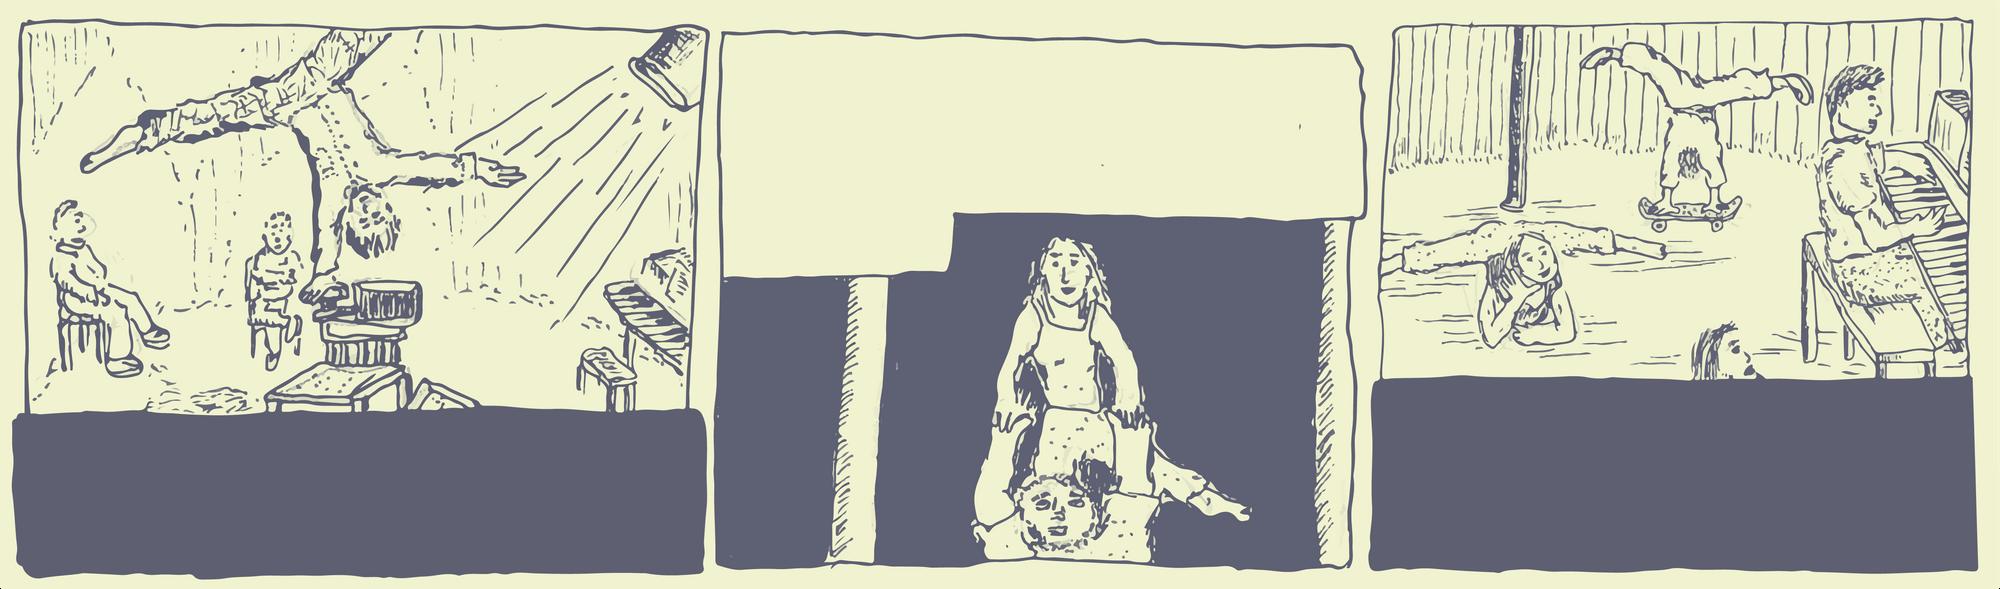 ☝️ a comic I drew in ~2010